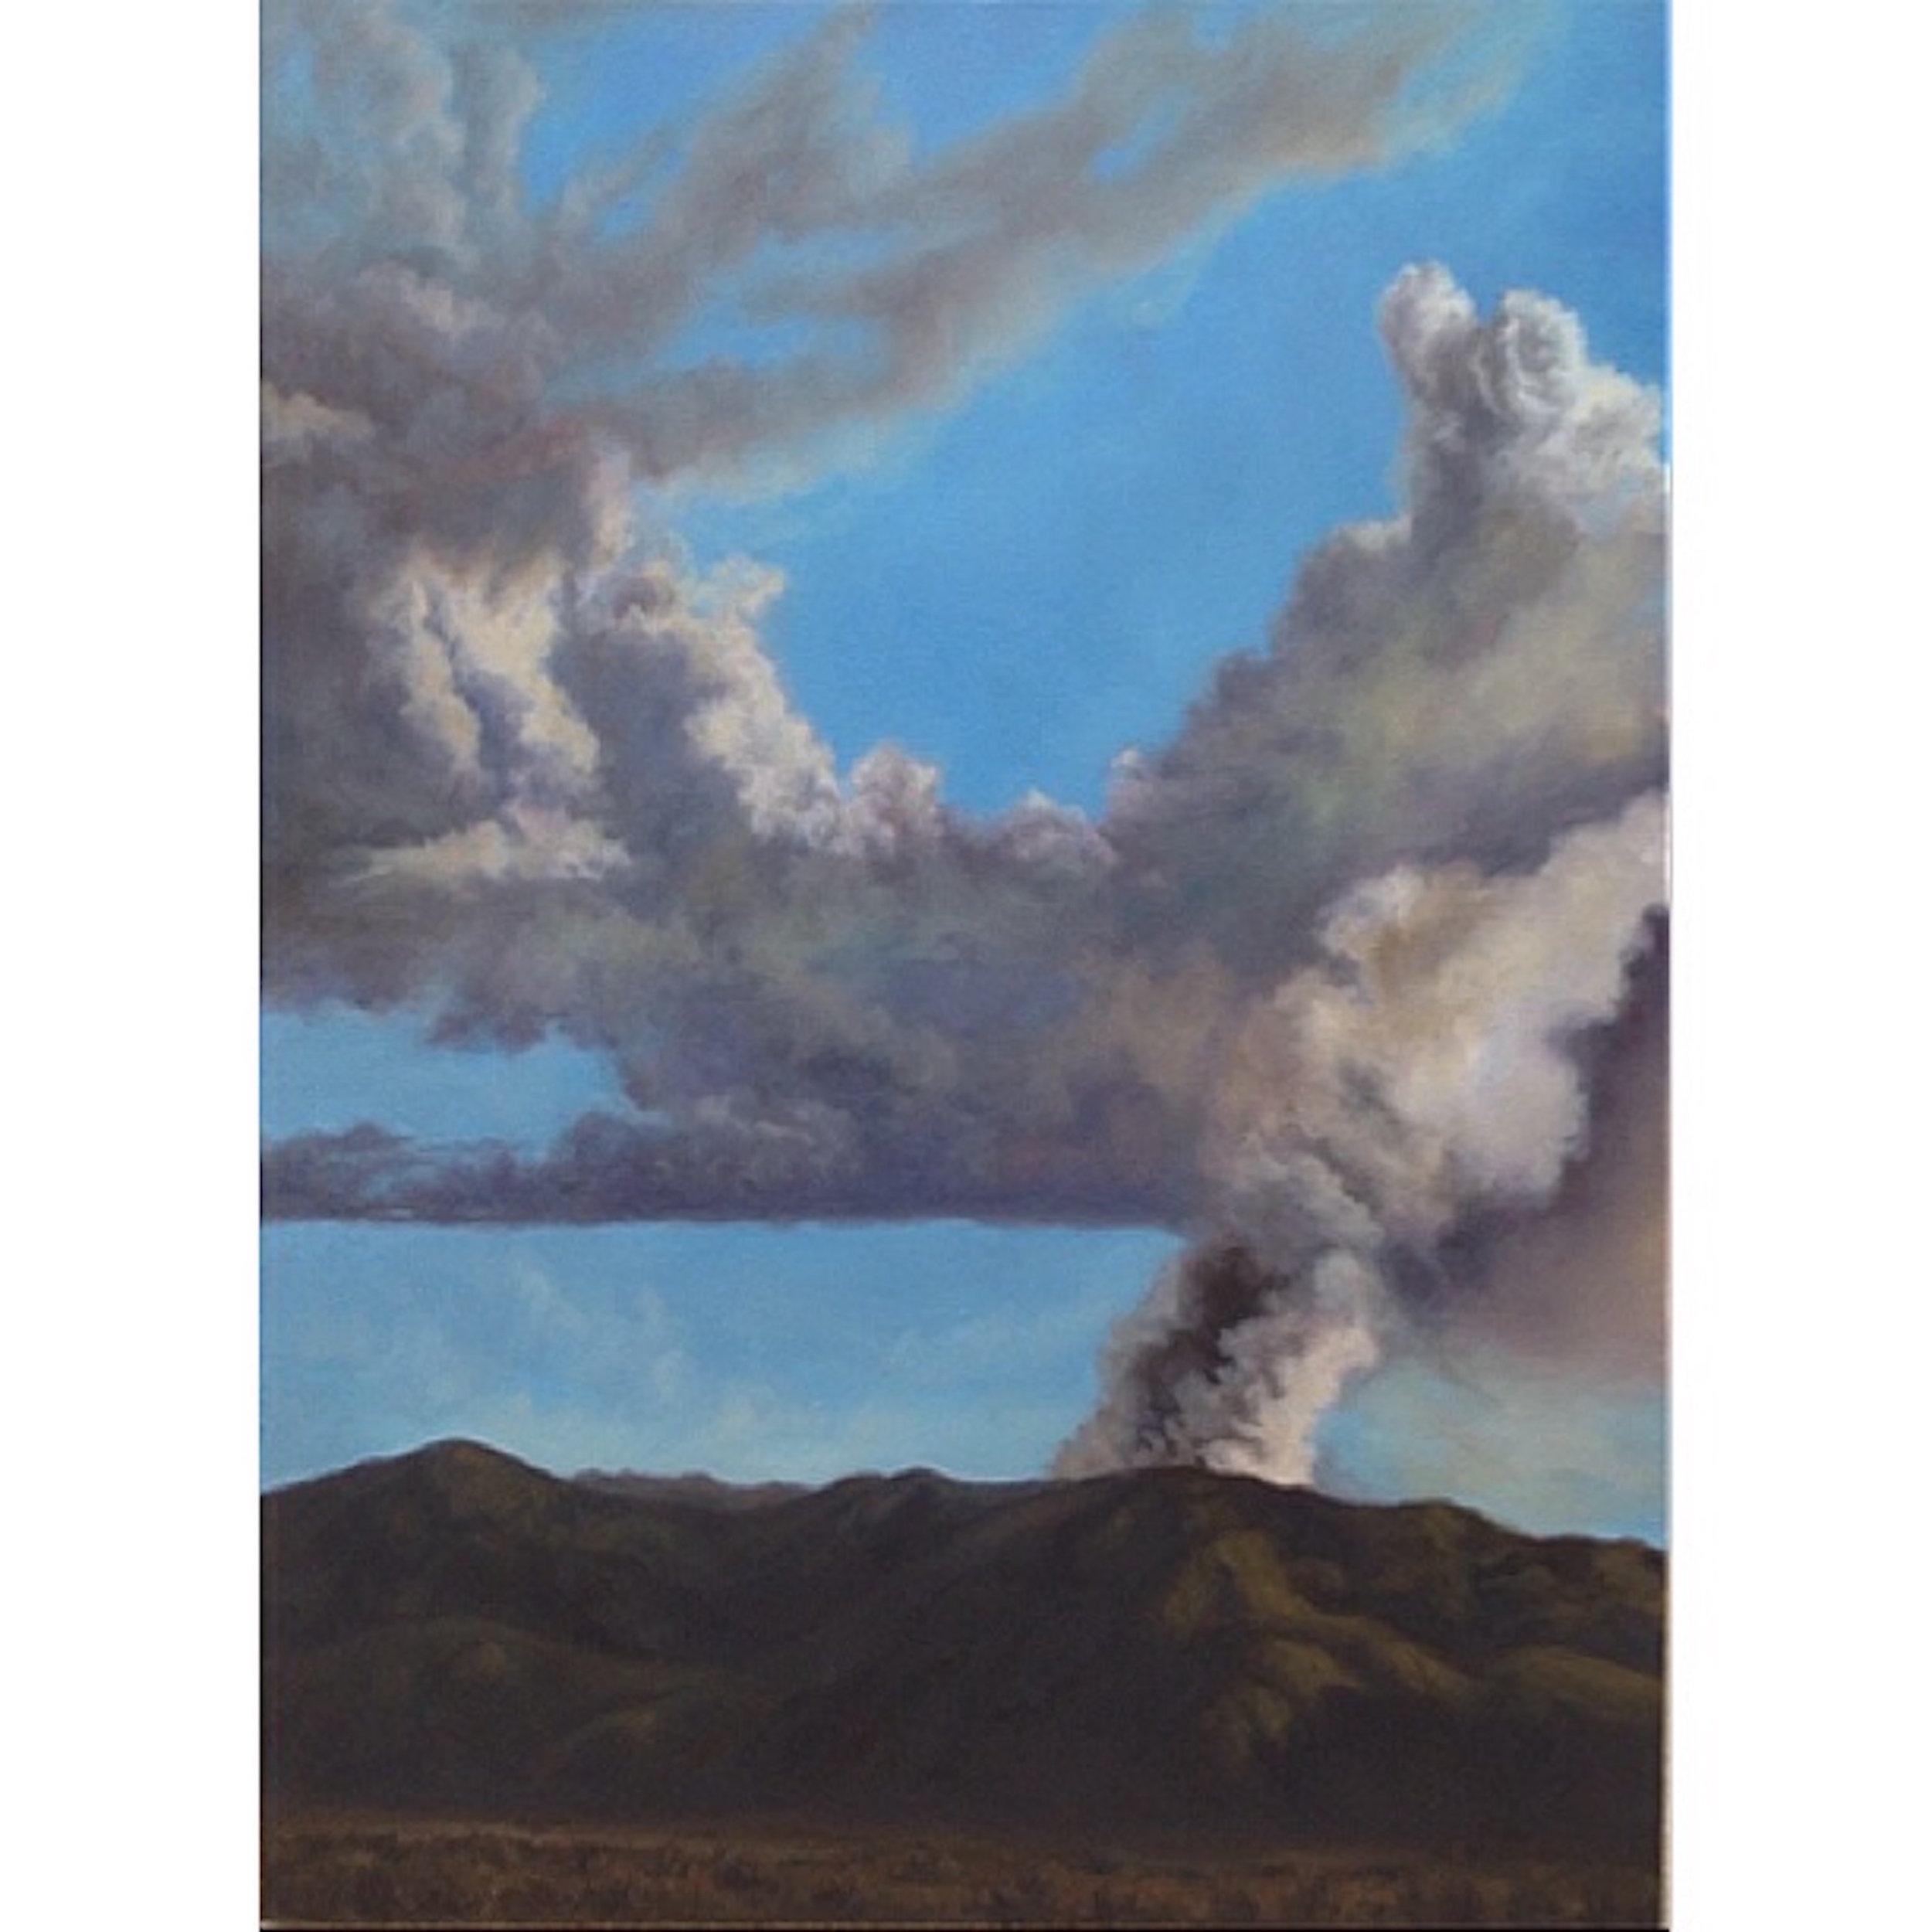 Where Smoke And Cloud Meet oil on canvas 18x24 2014 B.JPG